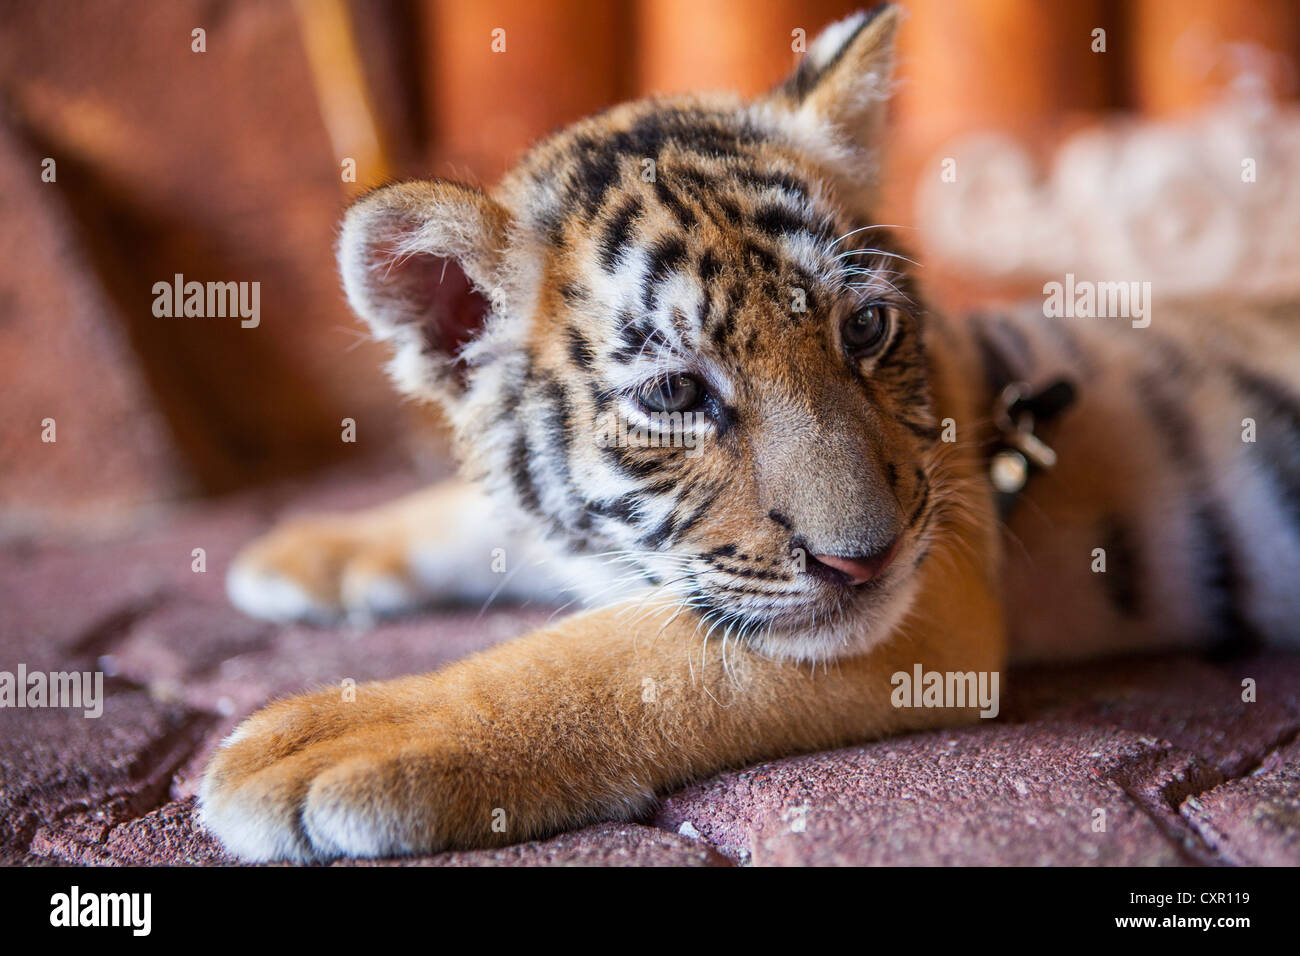 A captive baby tiger in Playa Del Carmen, Quintana Roo, Mexico - Stock Image